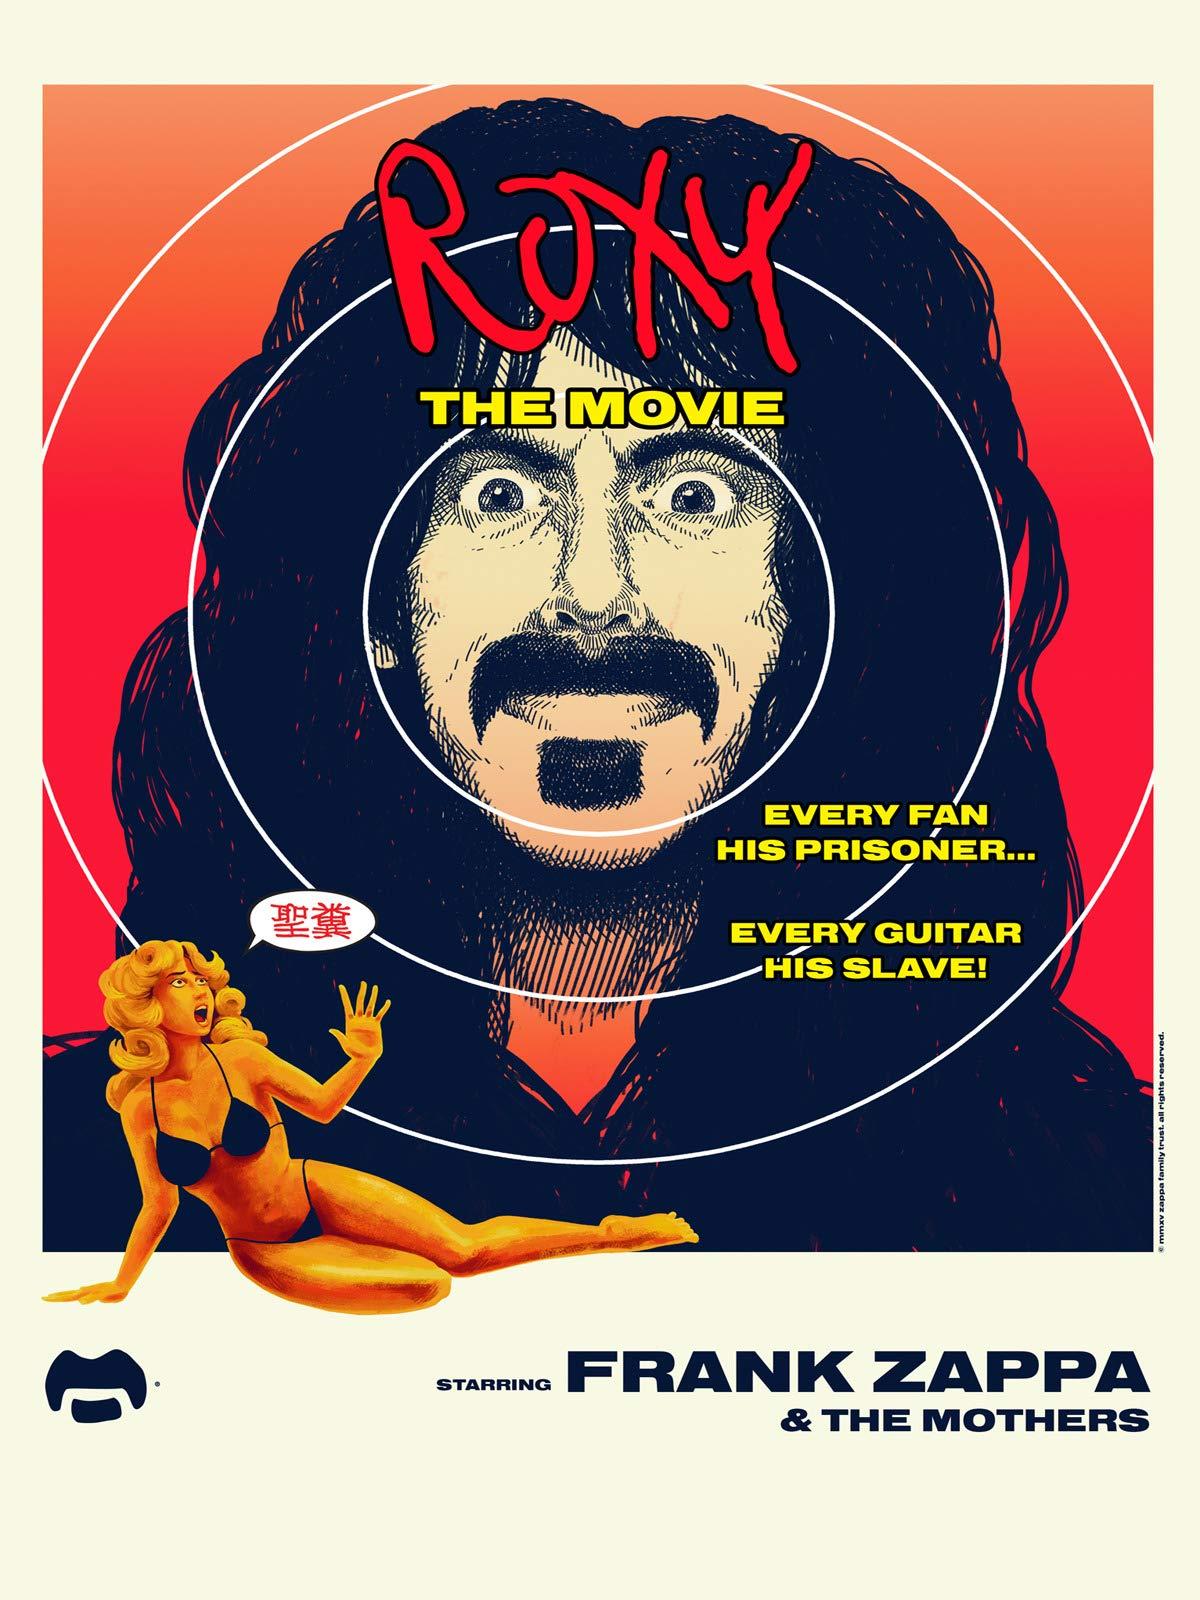 Frank Zappa & The Mothers - Roxy The Movie